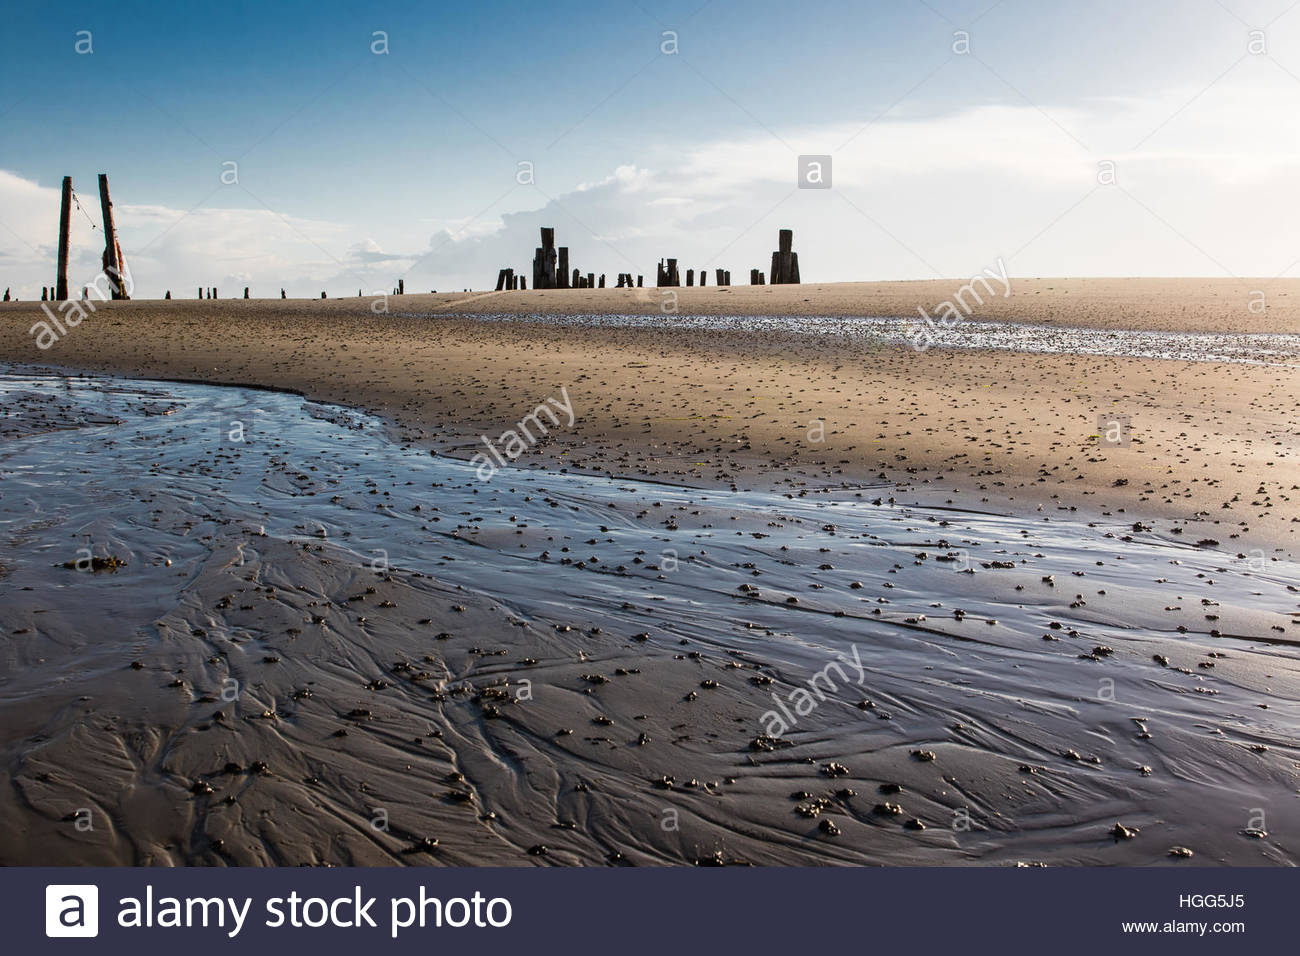 former ostanleger, wangerooge, friesland district, lower saxony, north sea, germany, june 2016 - Stock Image